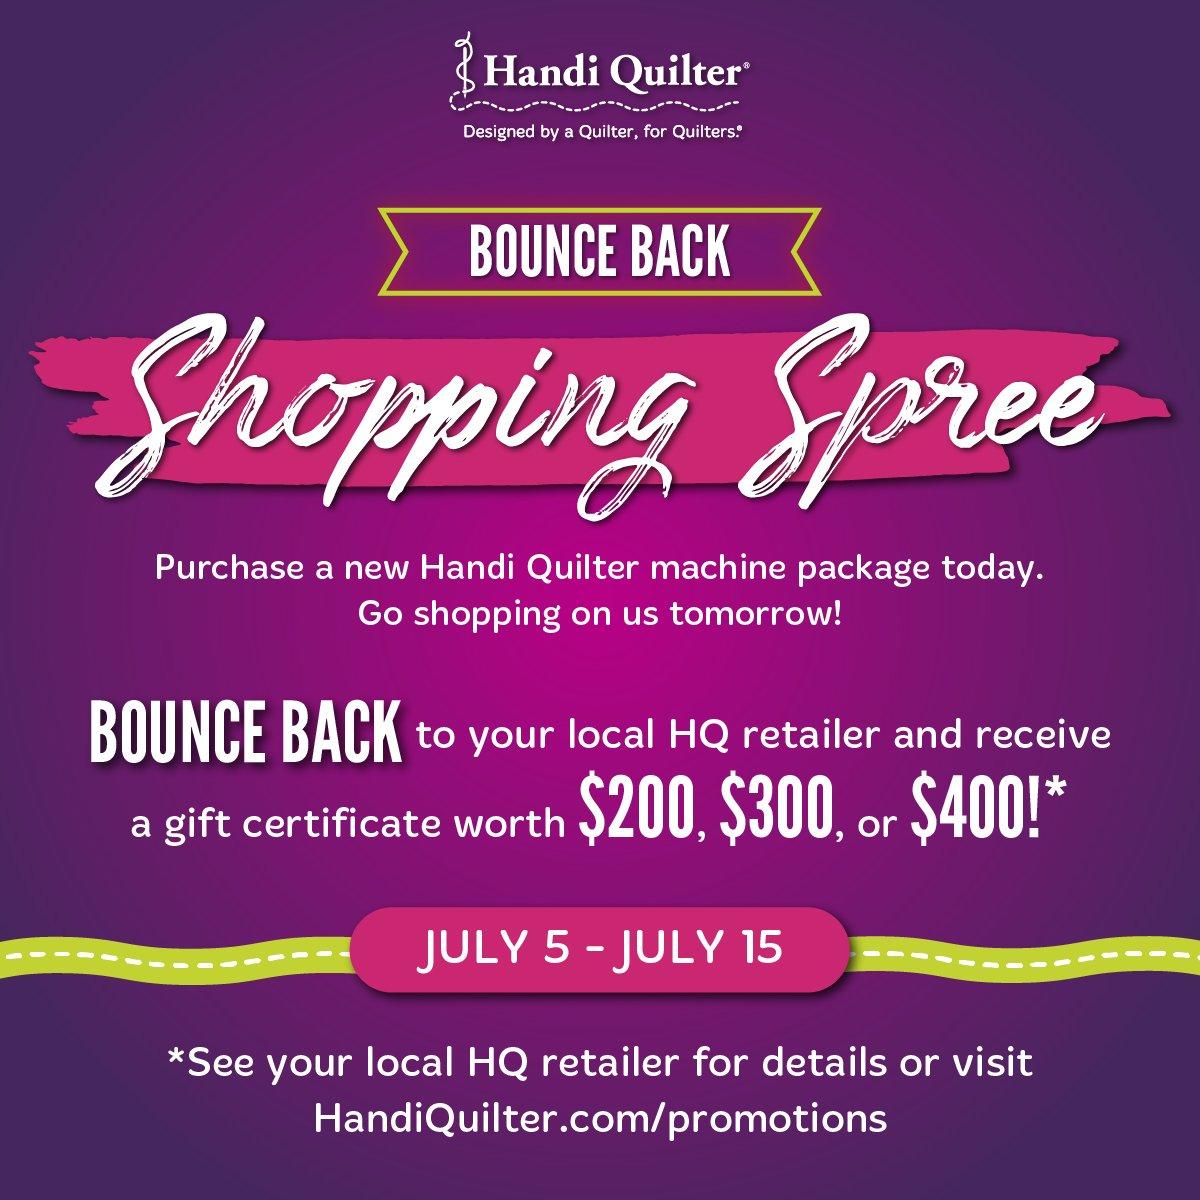 Handi Quilter Shopping Spree